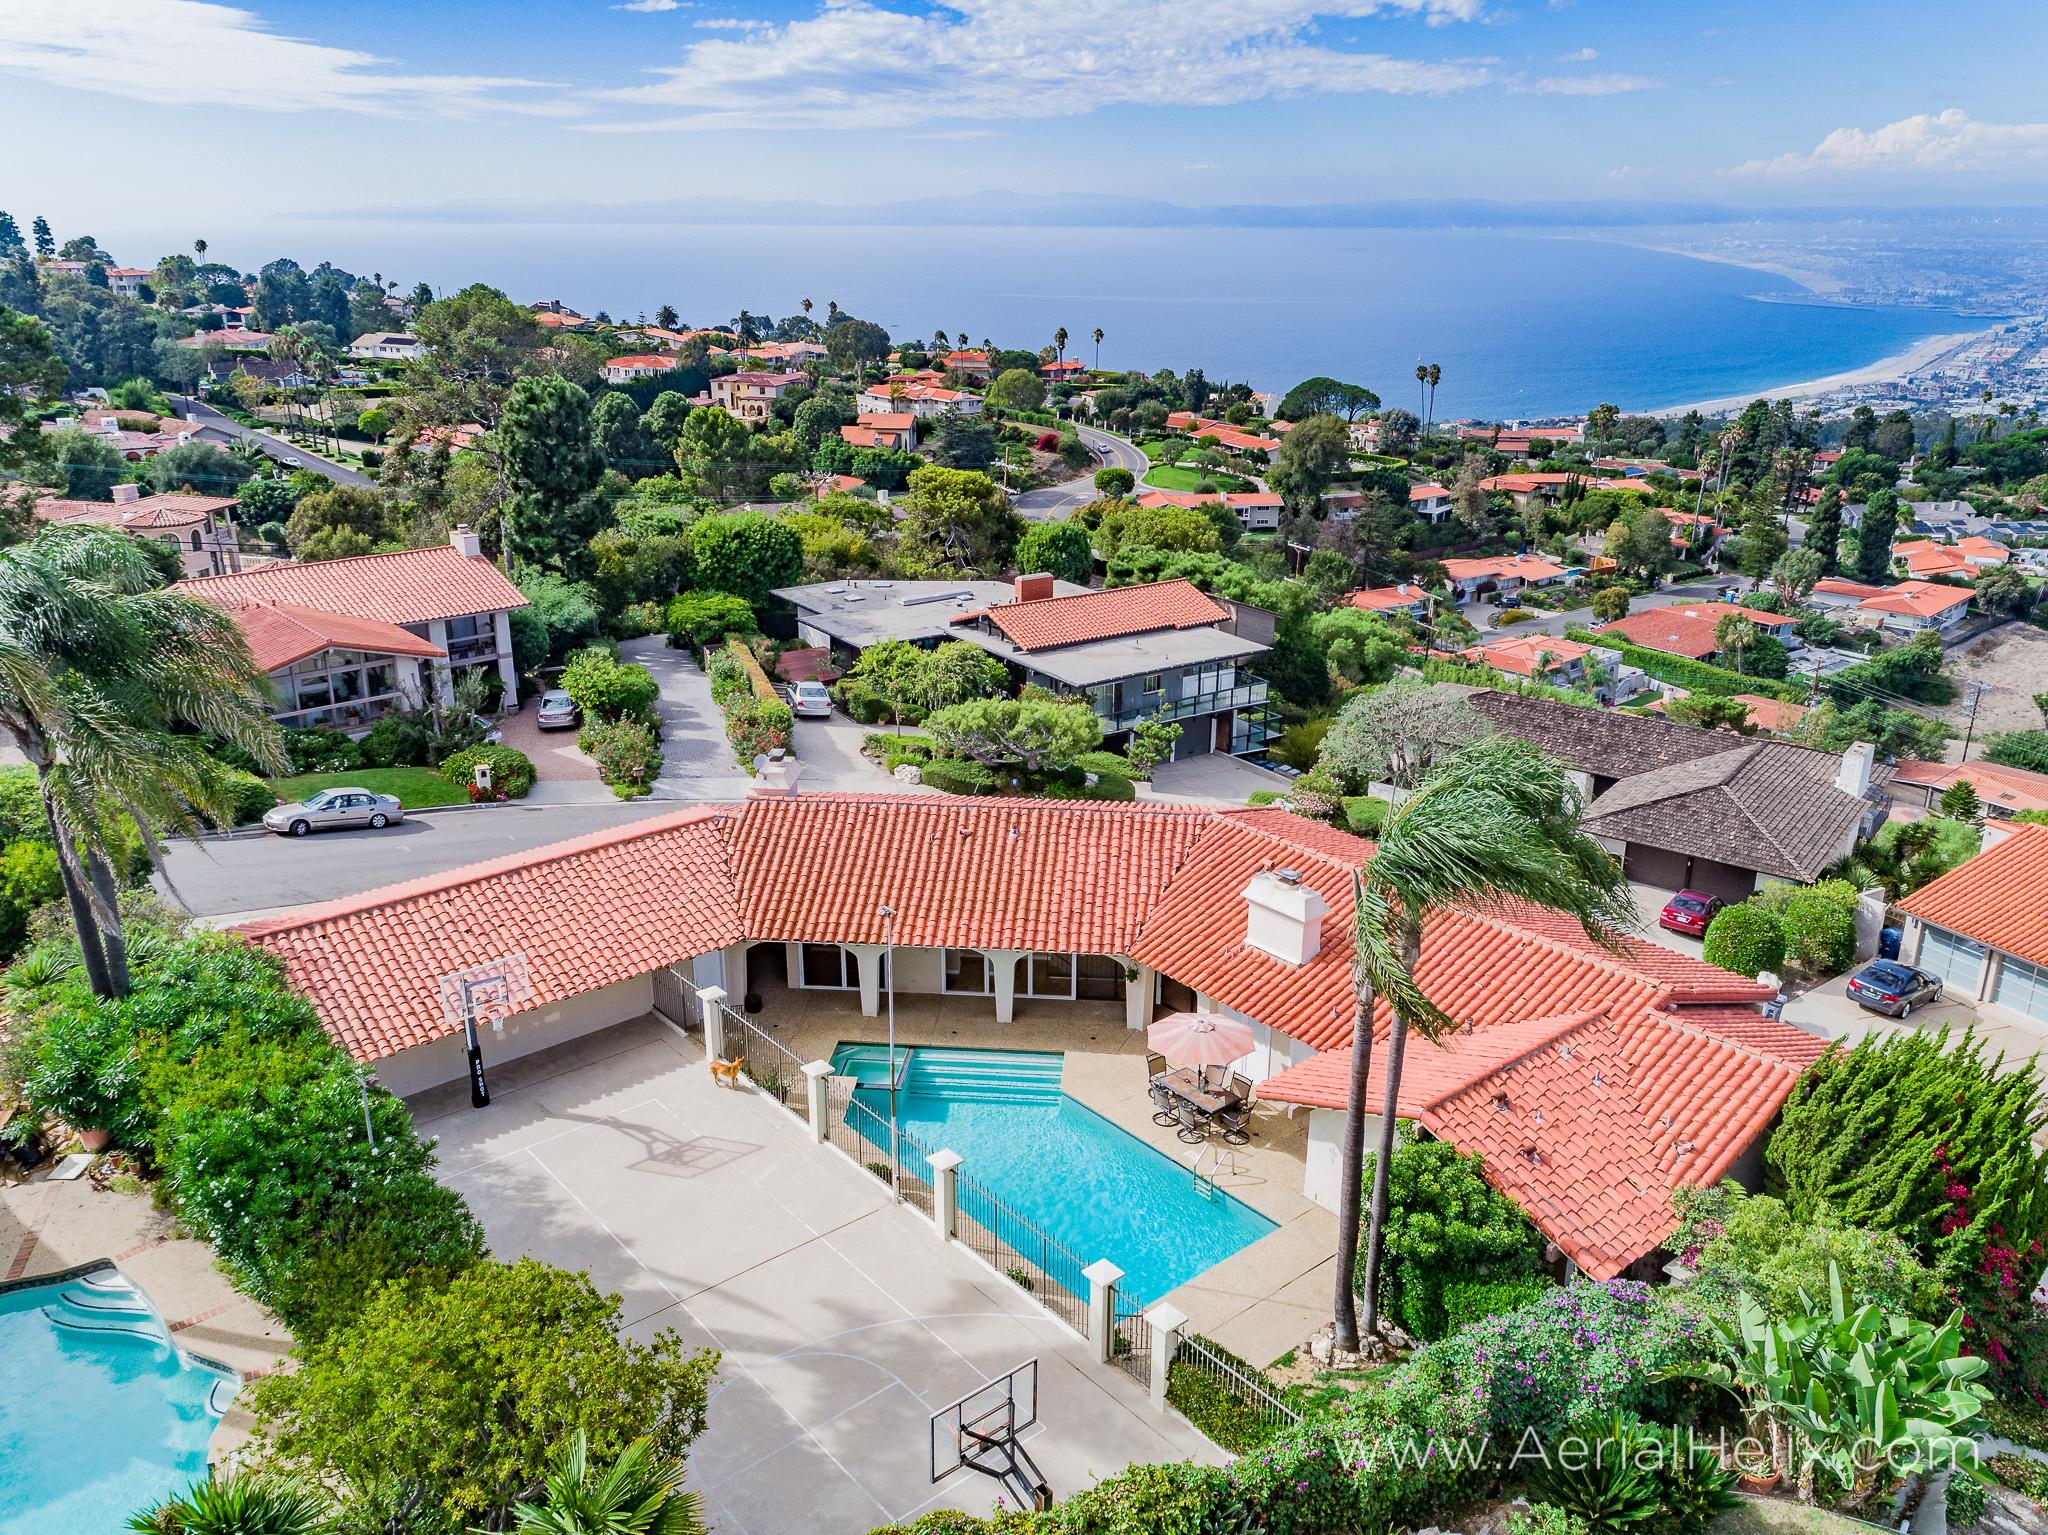 Woodfern Drive - HELIX Real Estate Aerial Photographer-1.jpg